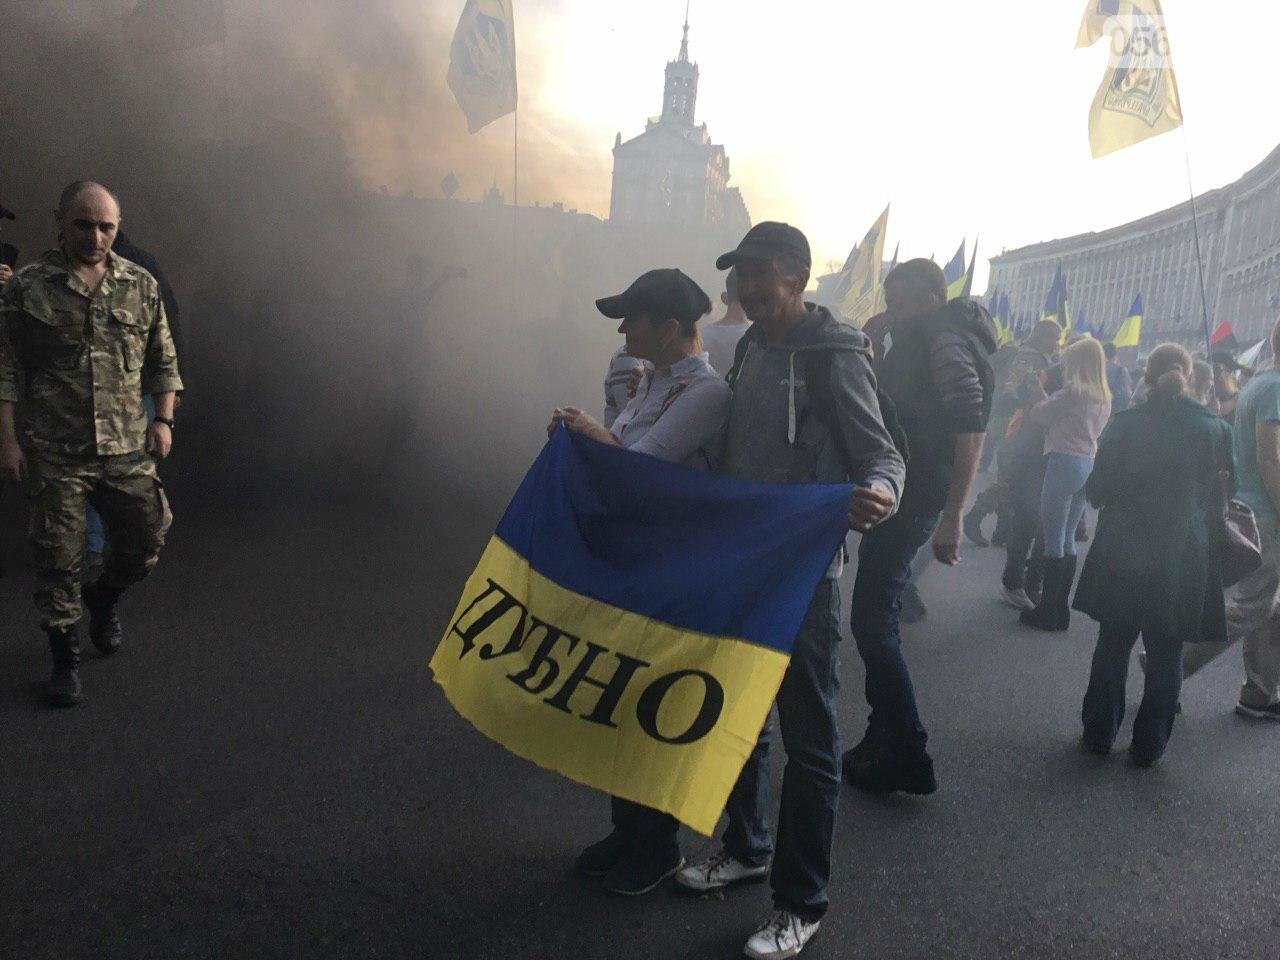 Криворожане поддержали Марш сопротивления капитуляции в Киеве, - ФОТО, ВИДЕО, ОБНОВЛЕНО, фото-32